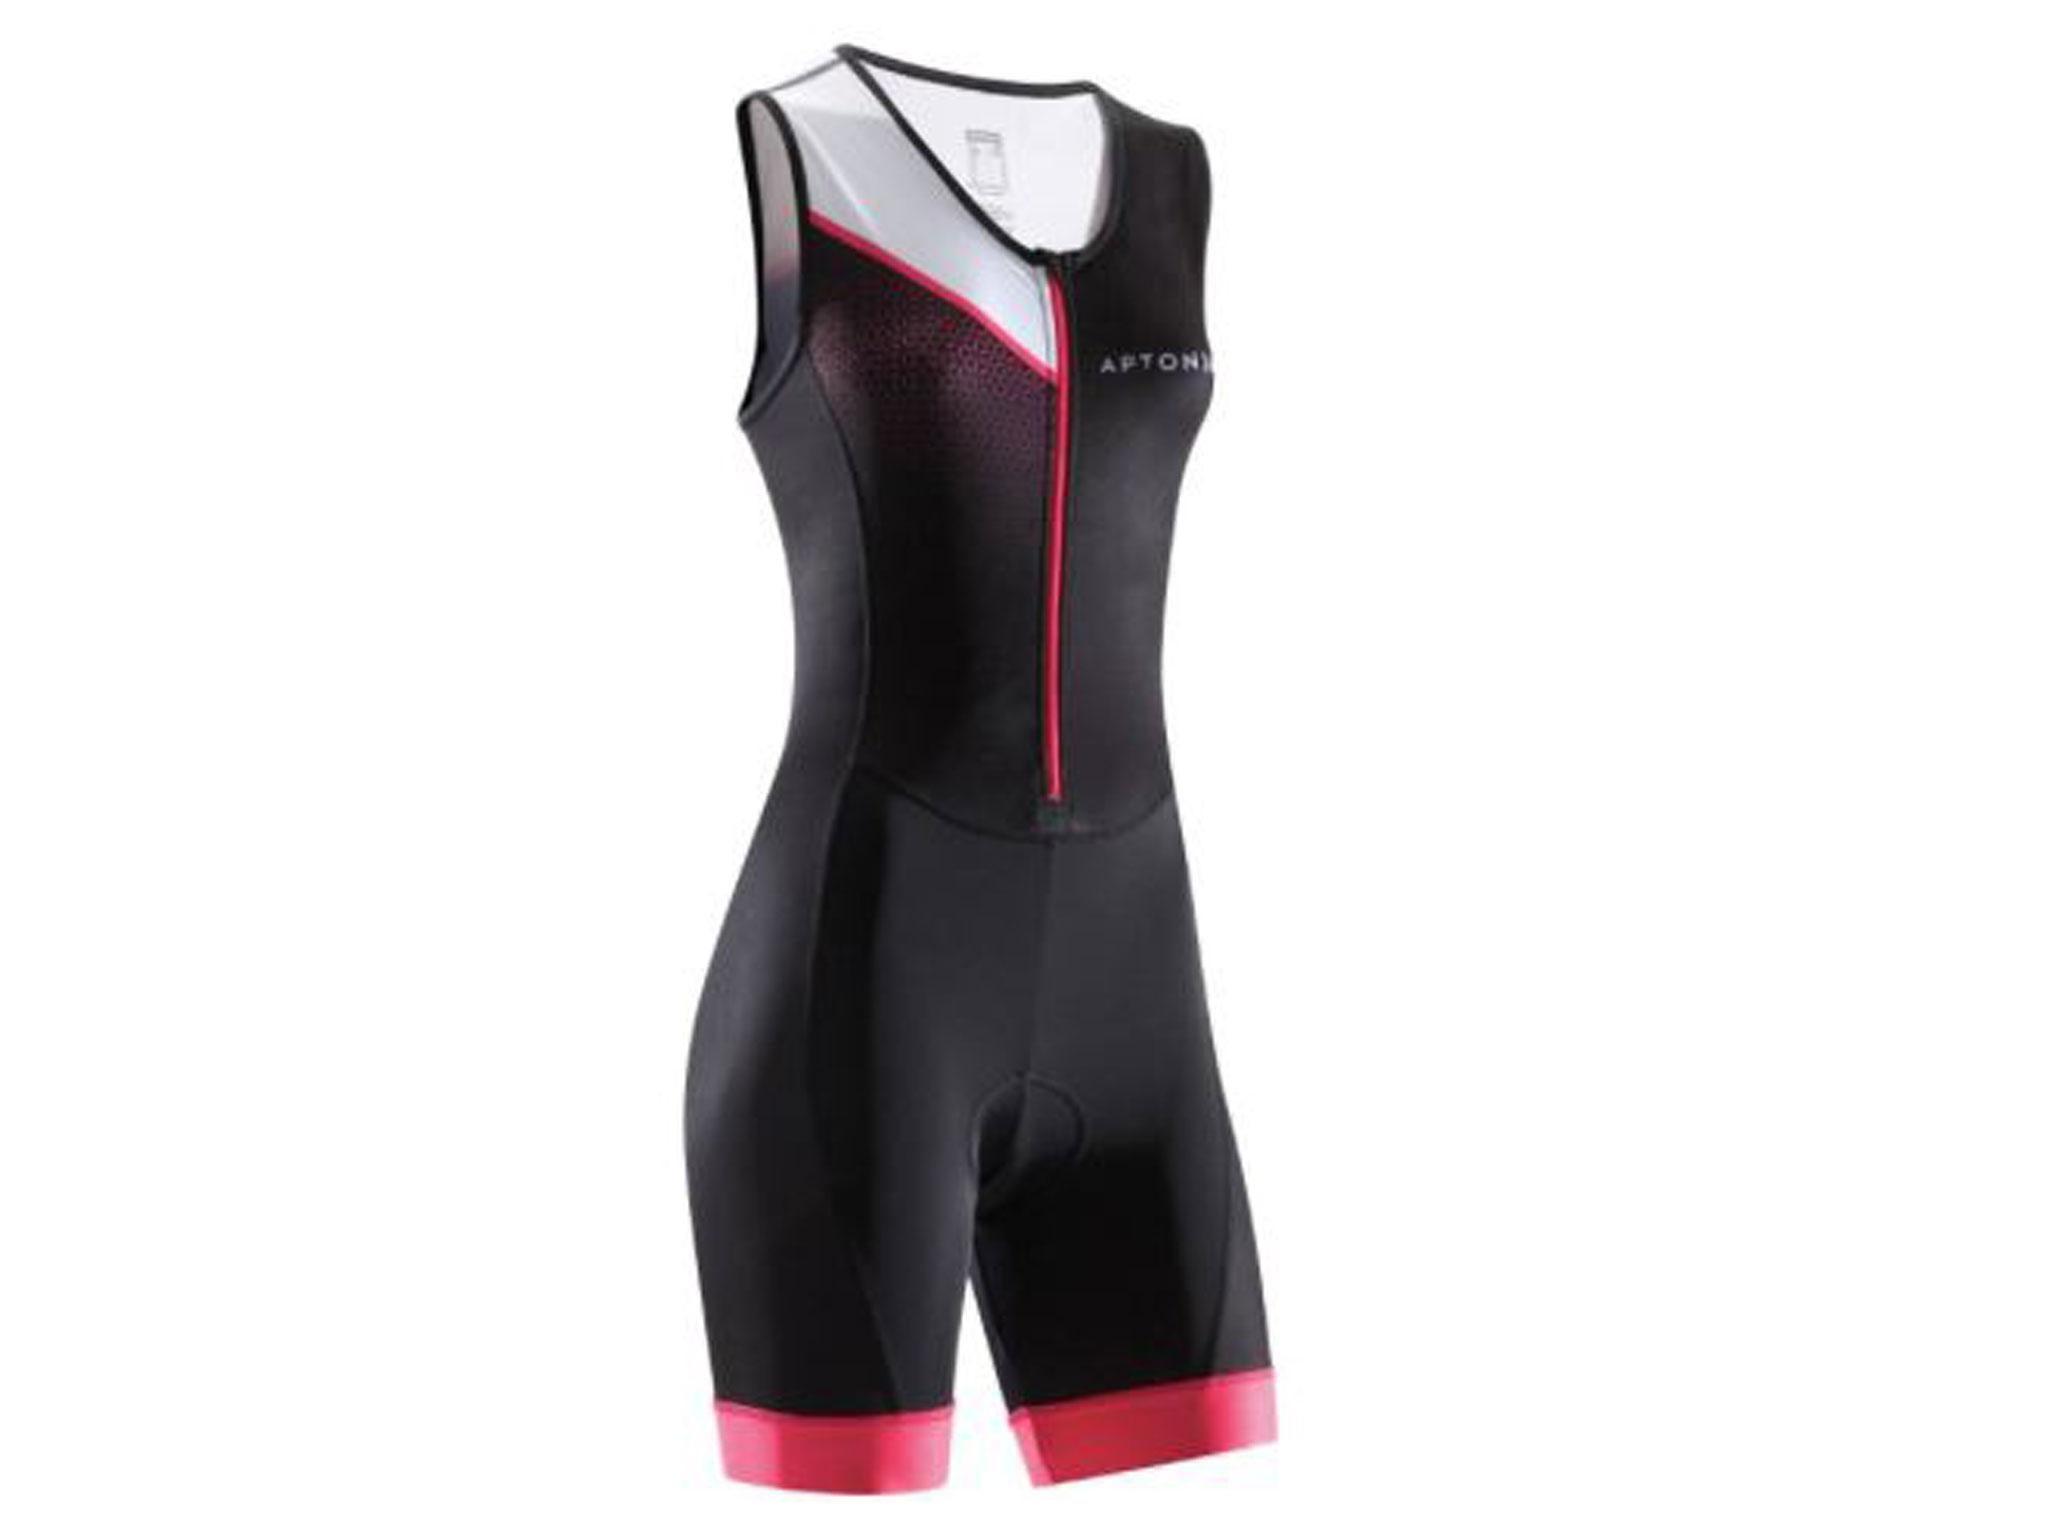 9c87eafc6 Aptonia SD Triathlon Women s Sleeveless Tri suit  £29.99